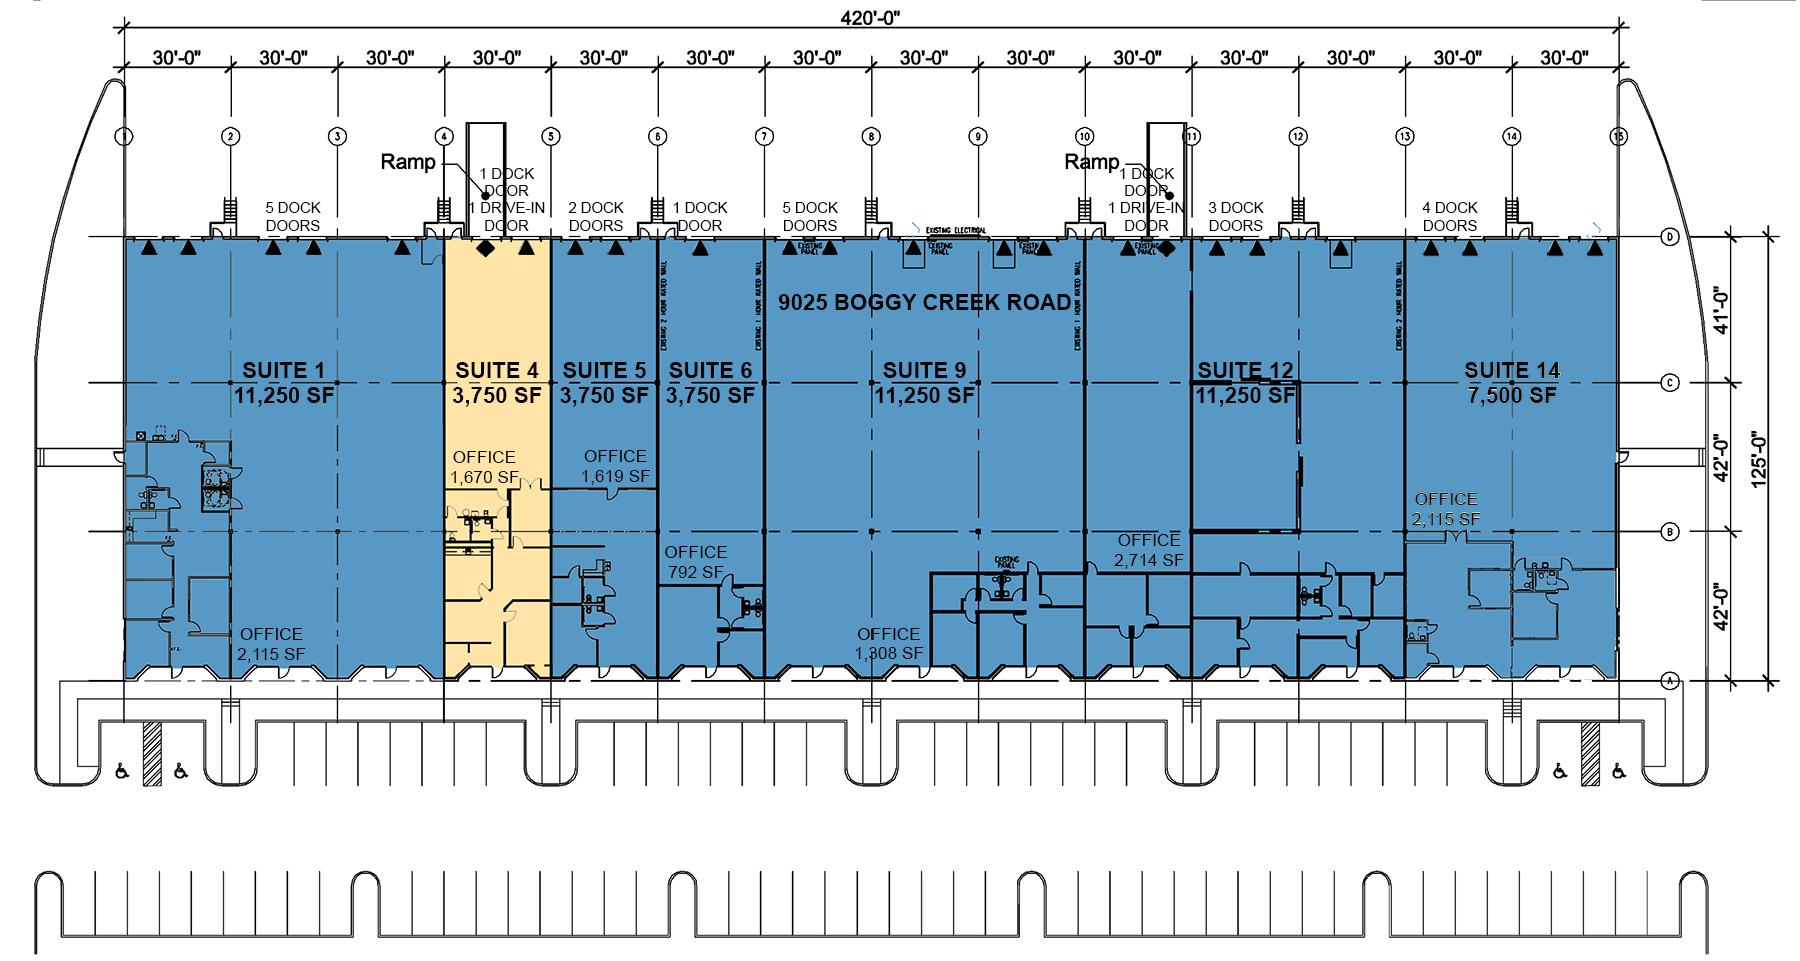 DPM-Airport-DC-2407_9025-Boggy-Creek-Rd_Flyer-Plan.jpg